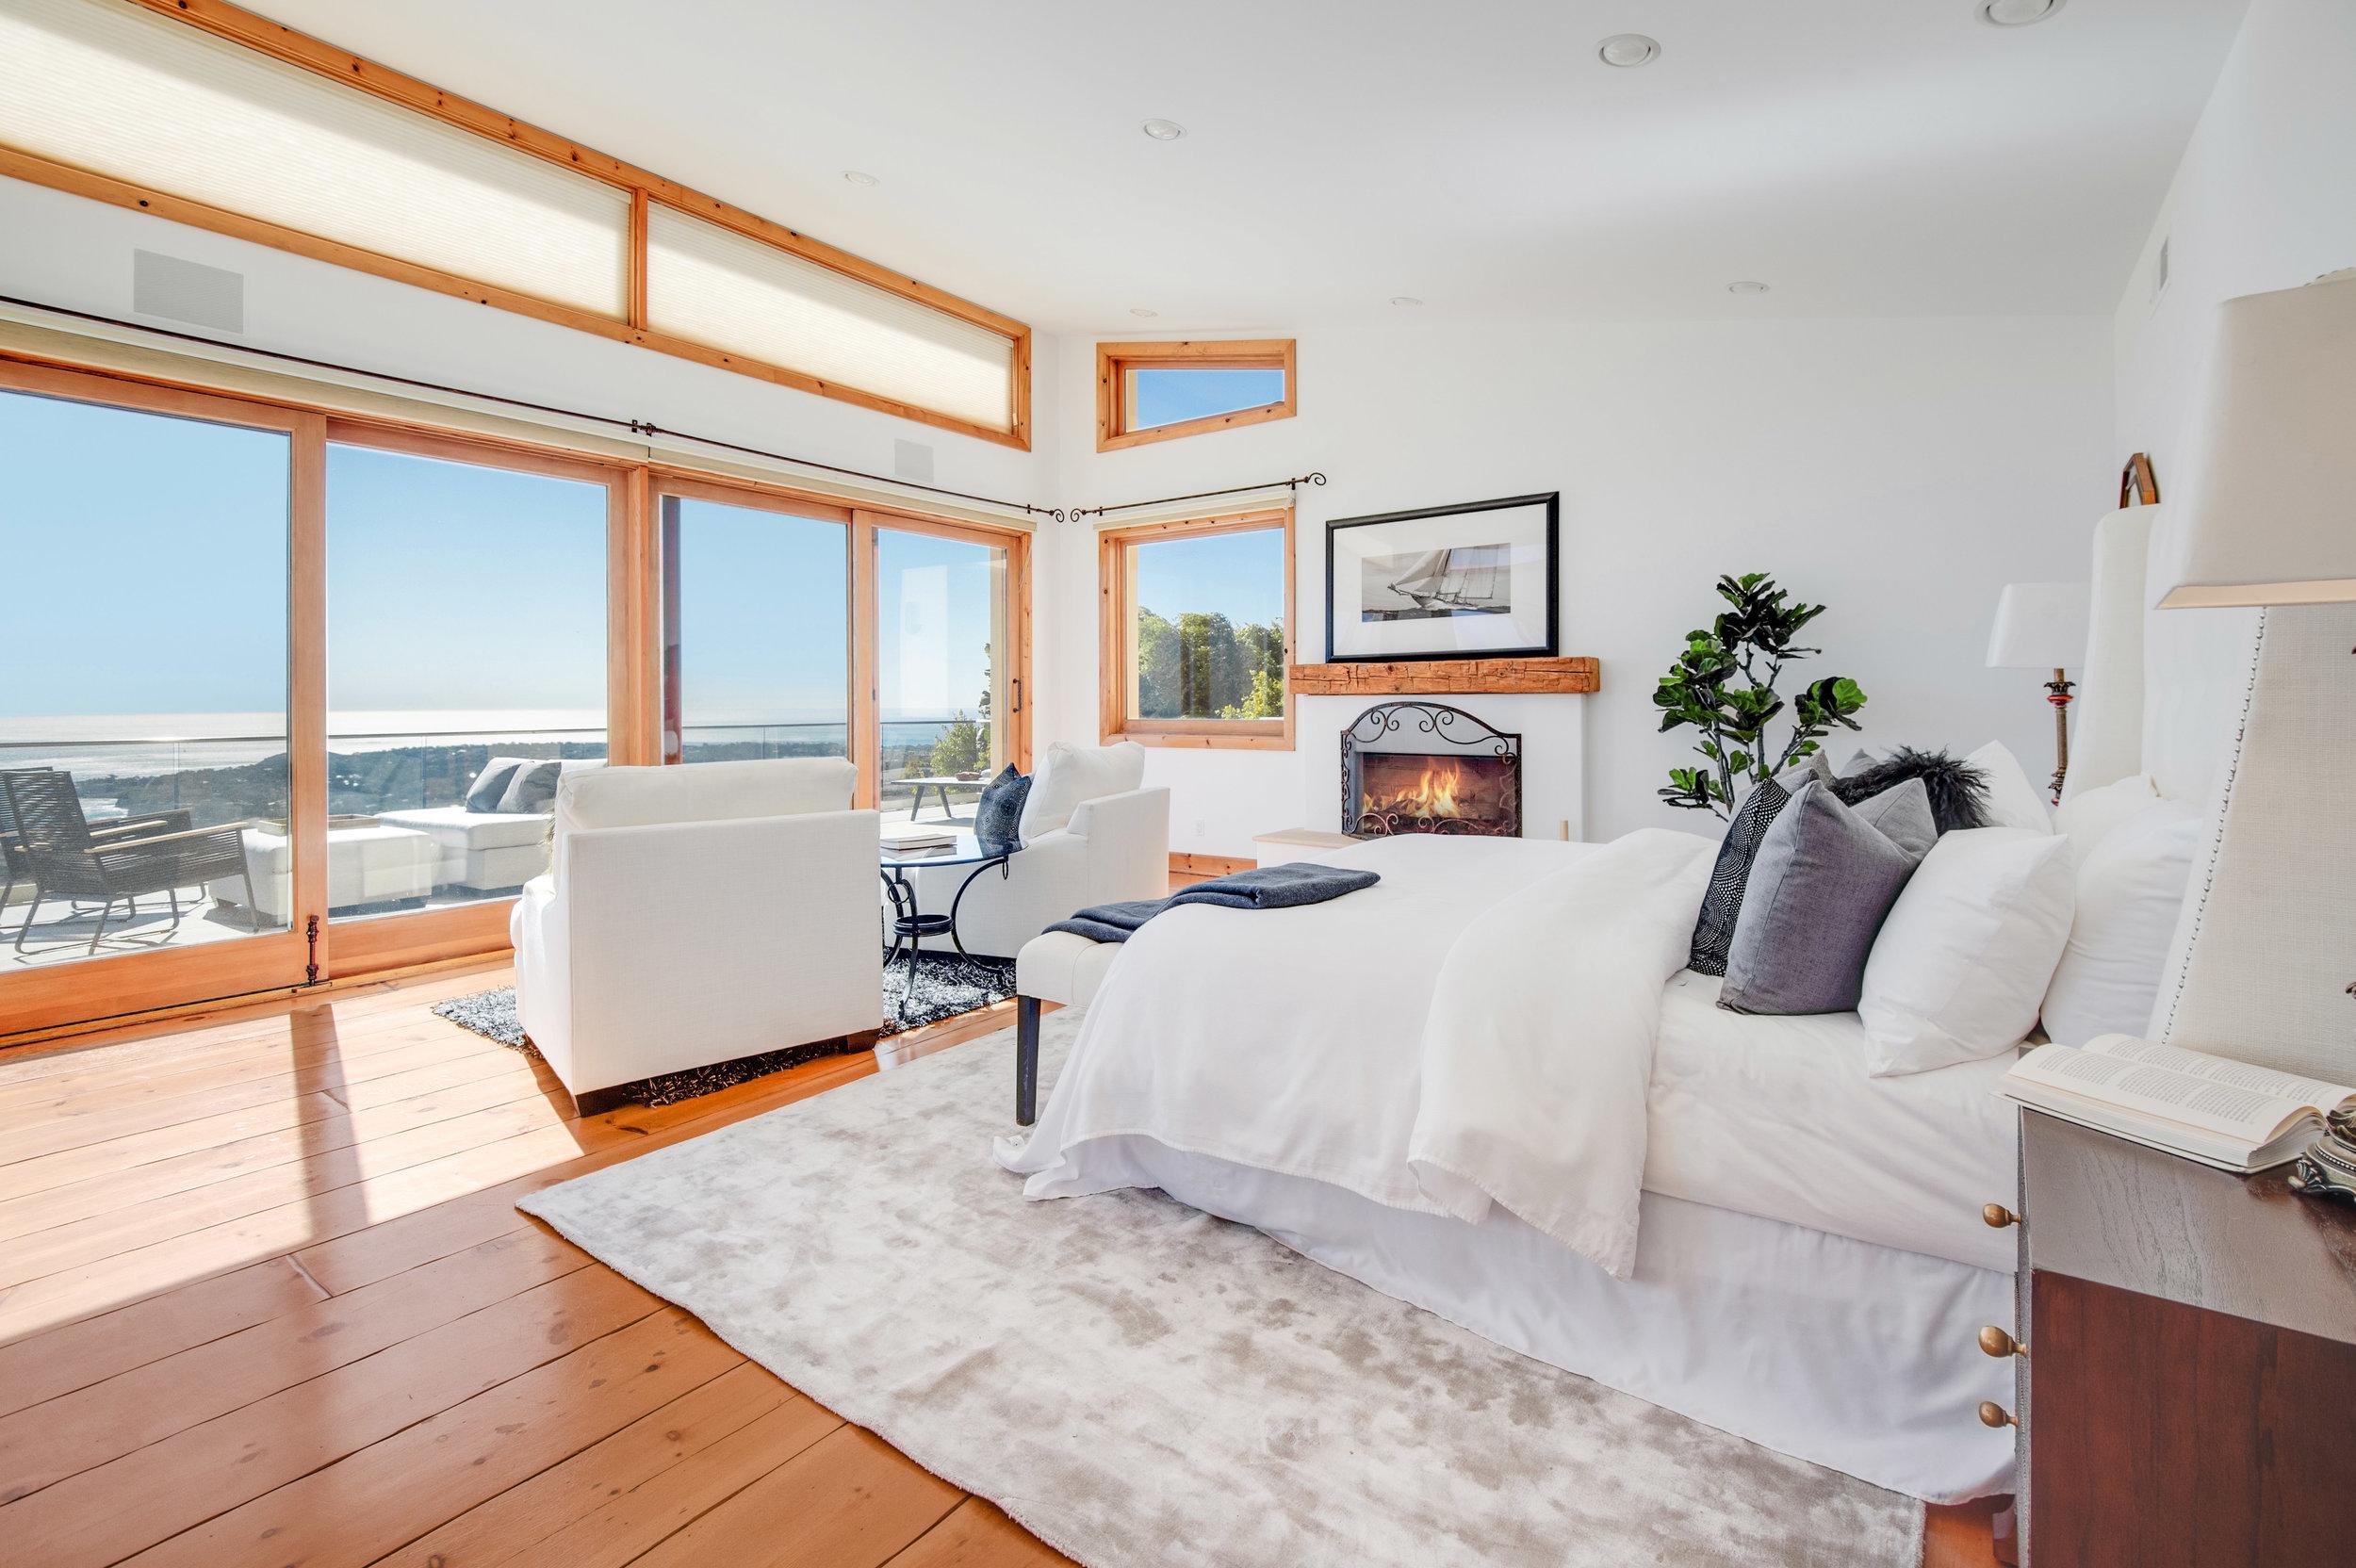 017 Master Bedroom 27475 Latigo Bay View Drive For Sale Lease The Malibu Life Team Luxury Real Estate.jpg